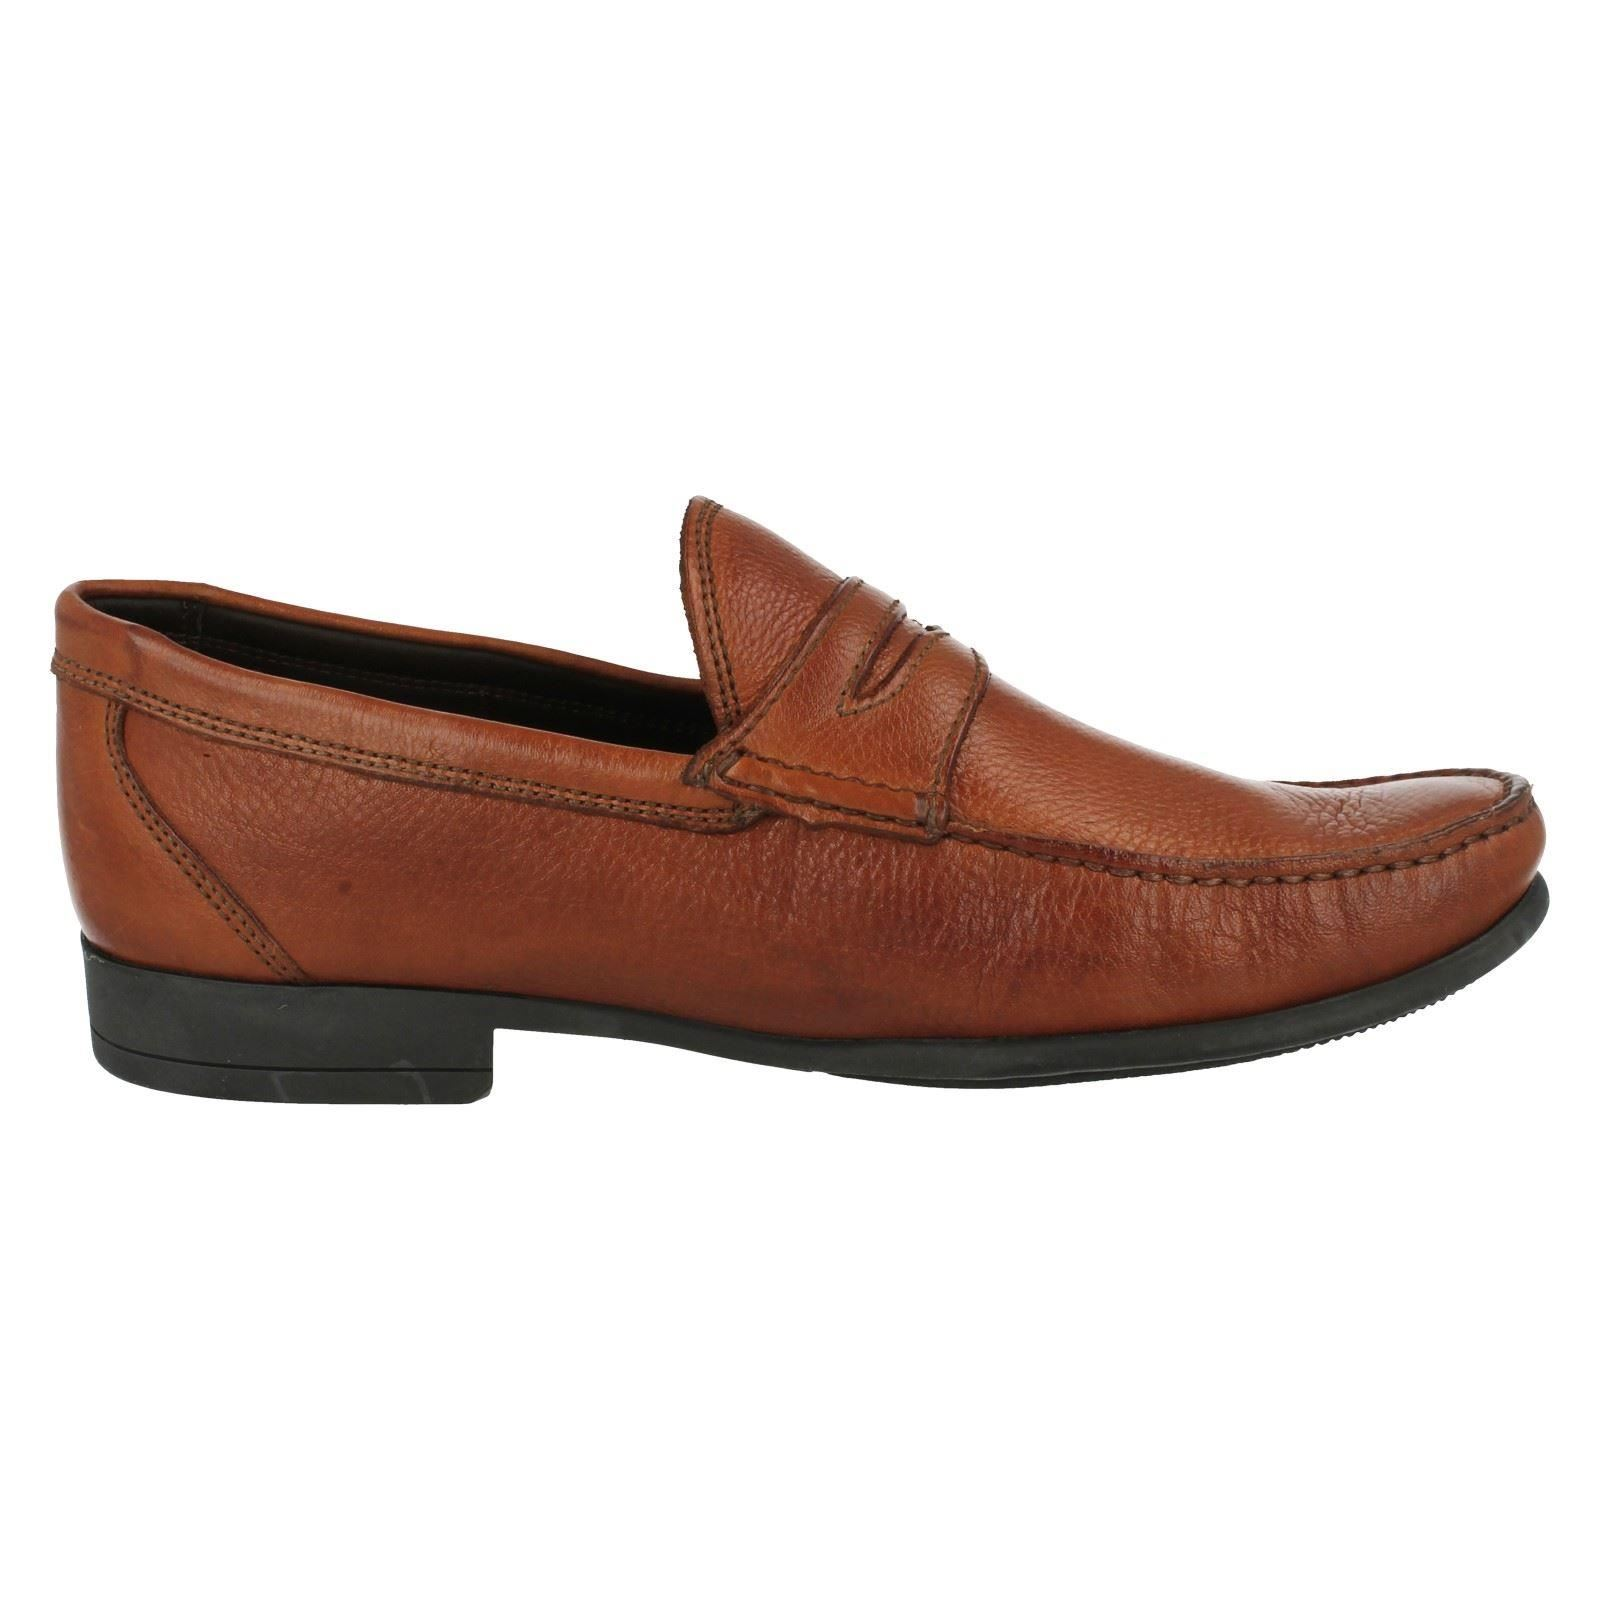 Floater marrone Tan Mens Toast Castelo Anatomic Loafers Smart x4fw0YqA